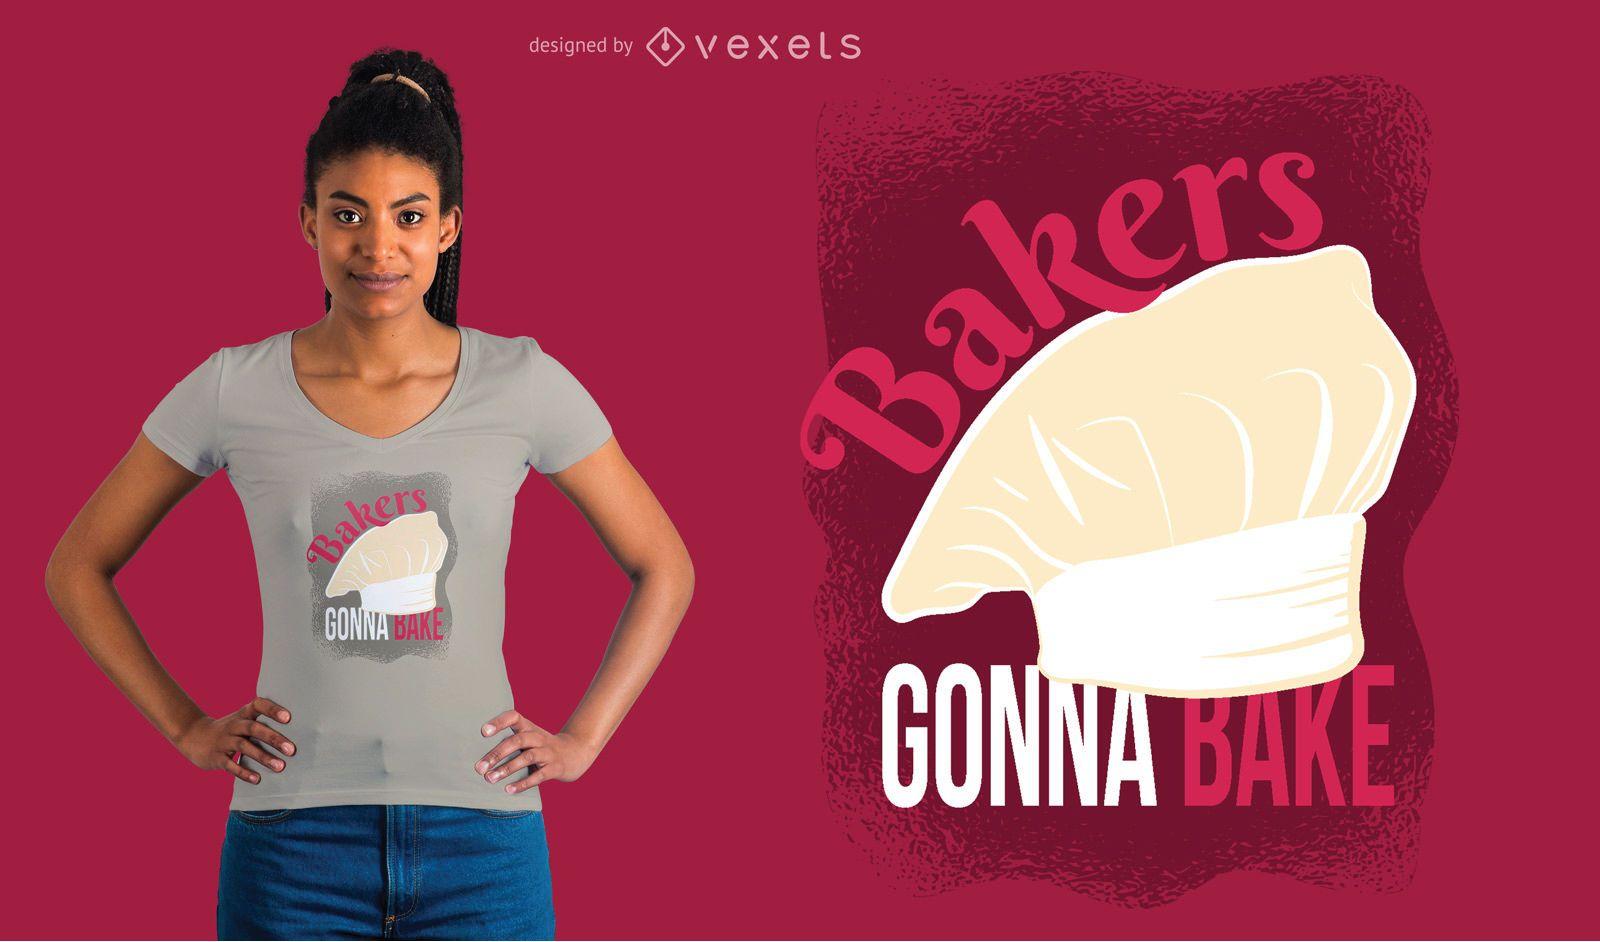 Bakers Gonna Bake T-shirt Design